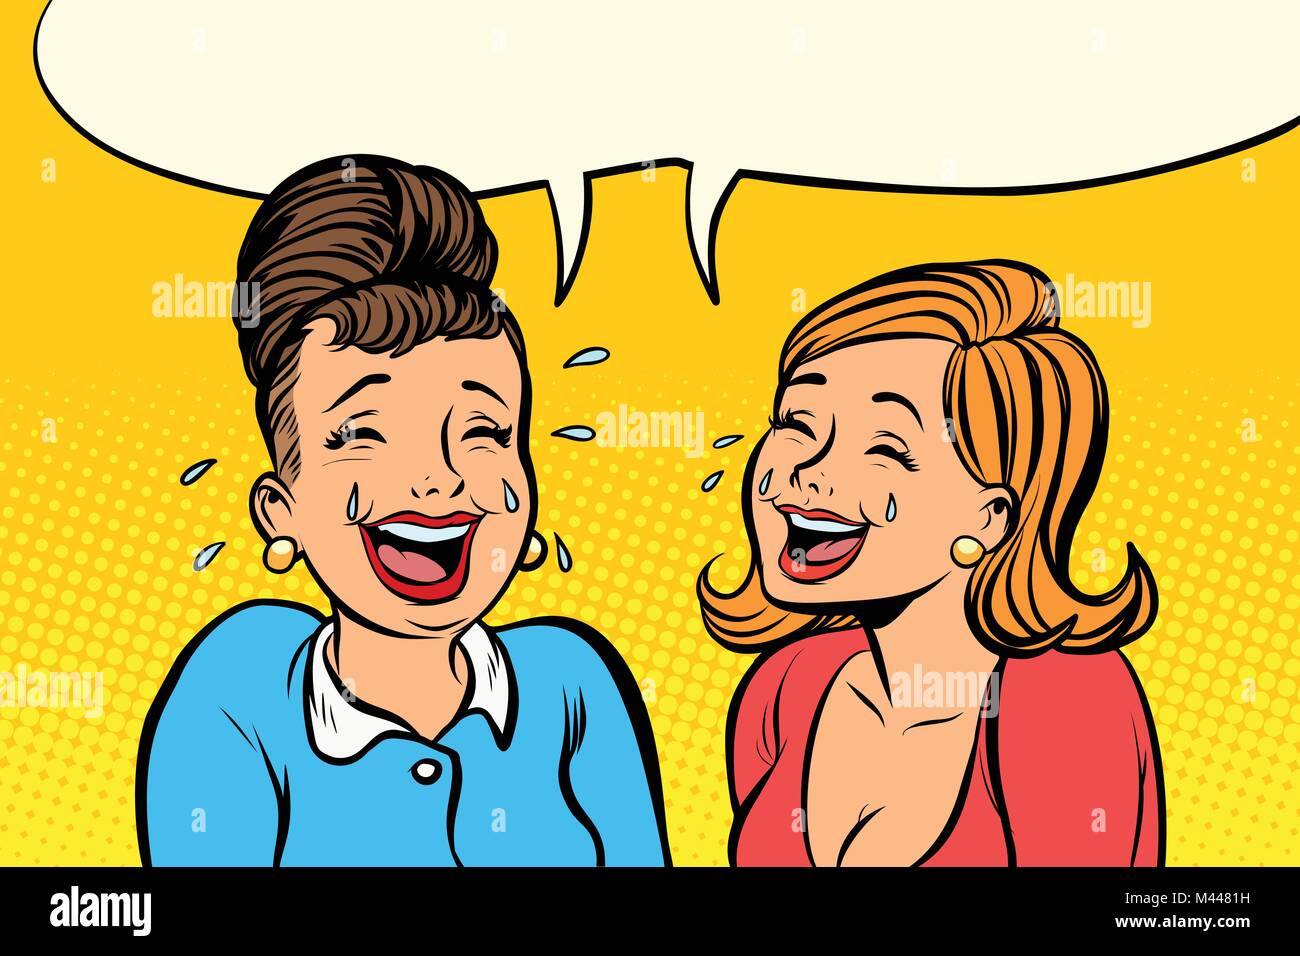 Joyful girlfriends women laugh - Stock Image